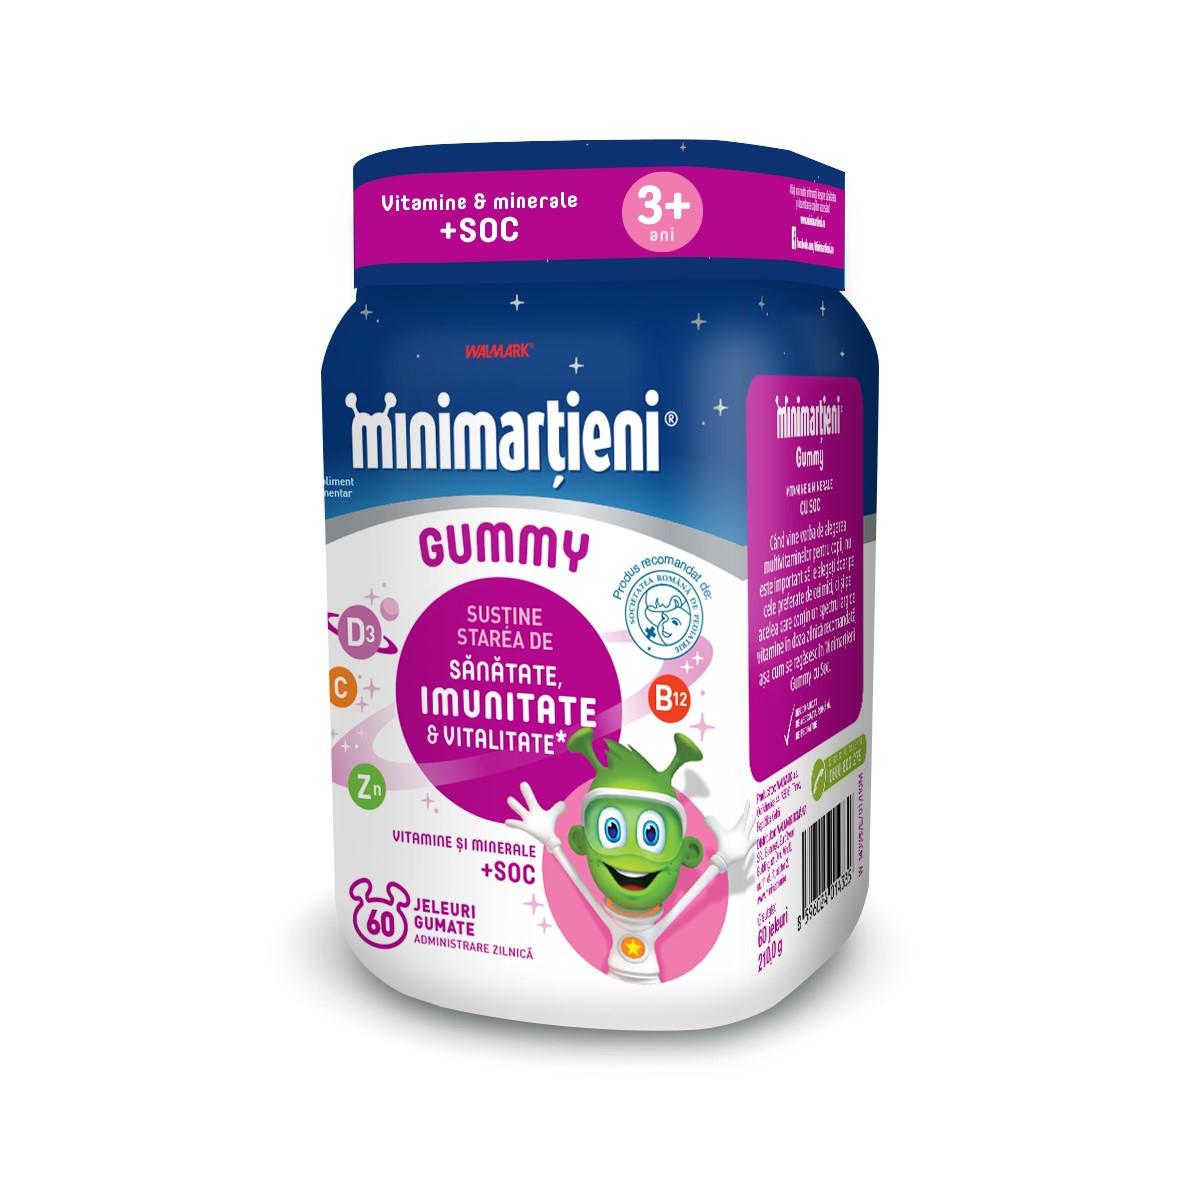 Minimartieni Gummy cu soc, 60 jeleuri, Walmark drmax.ro